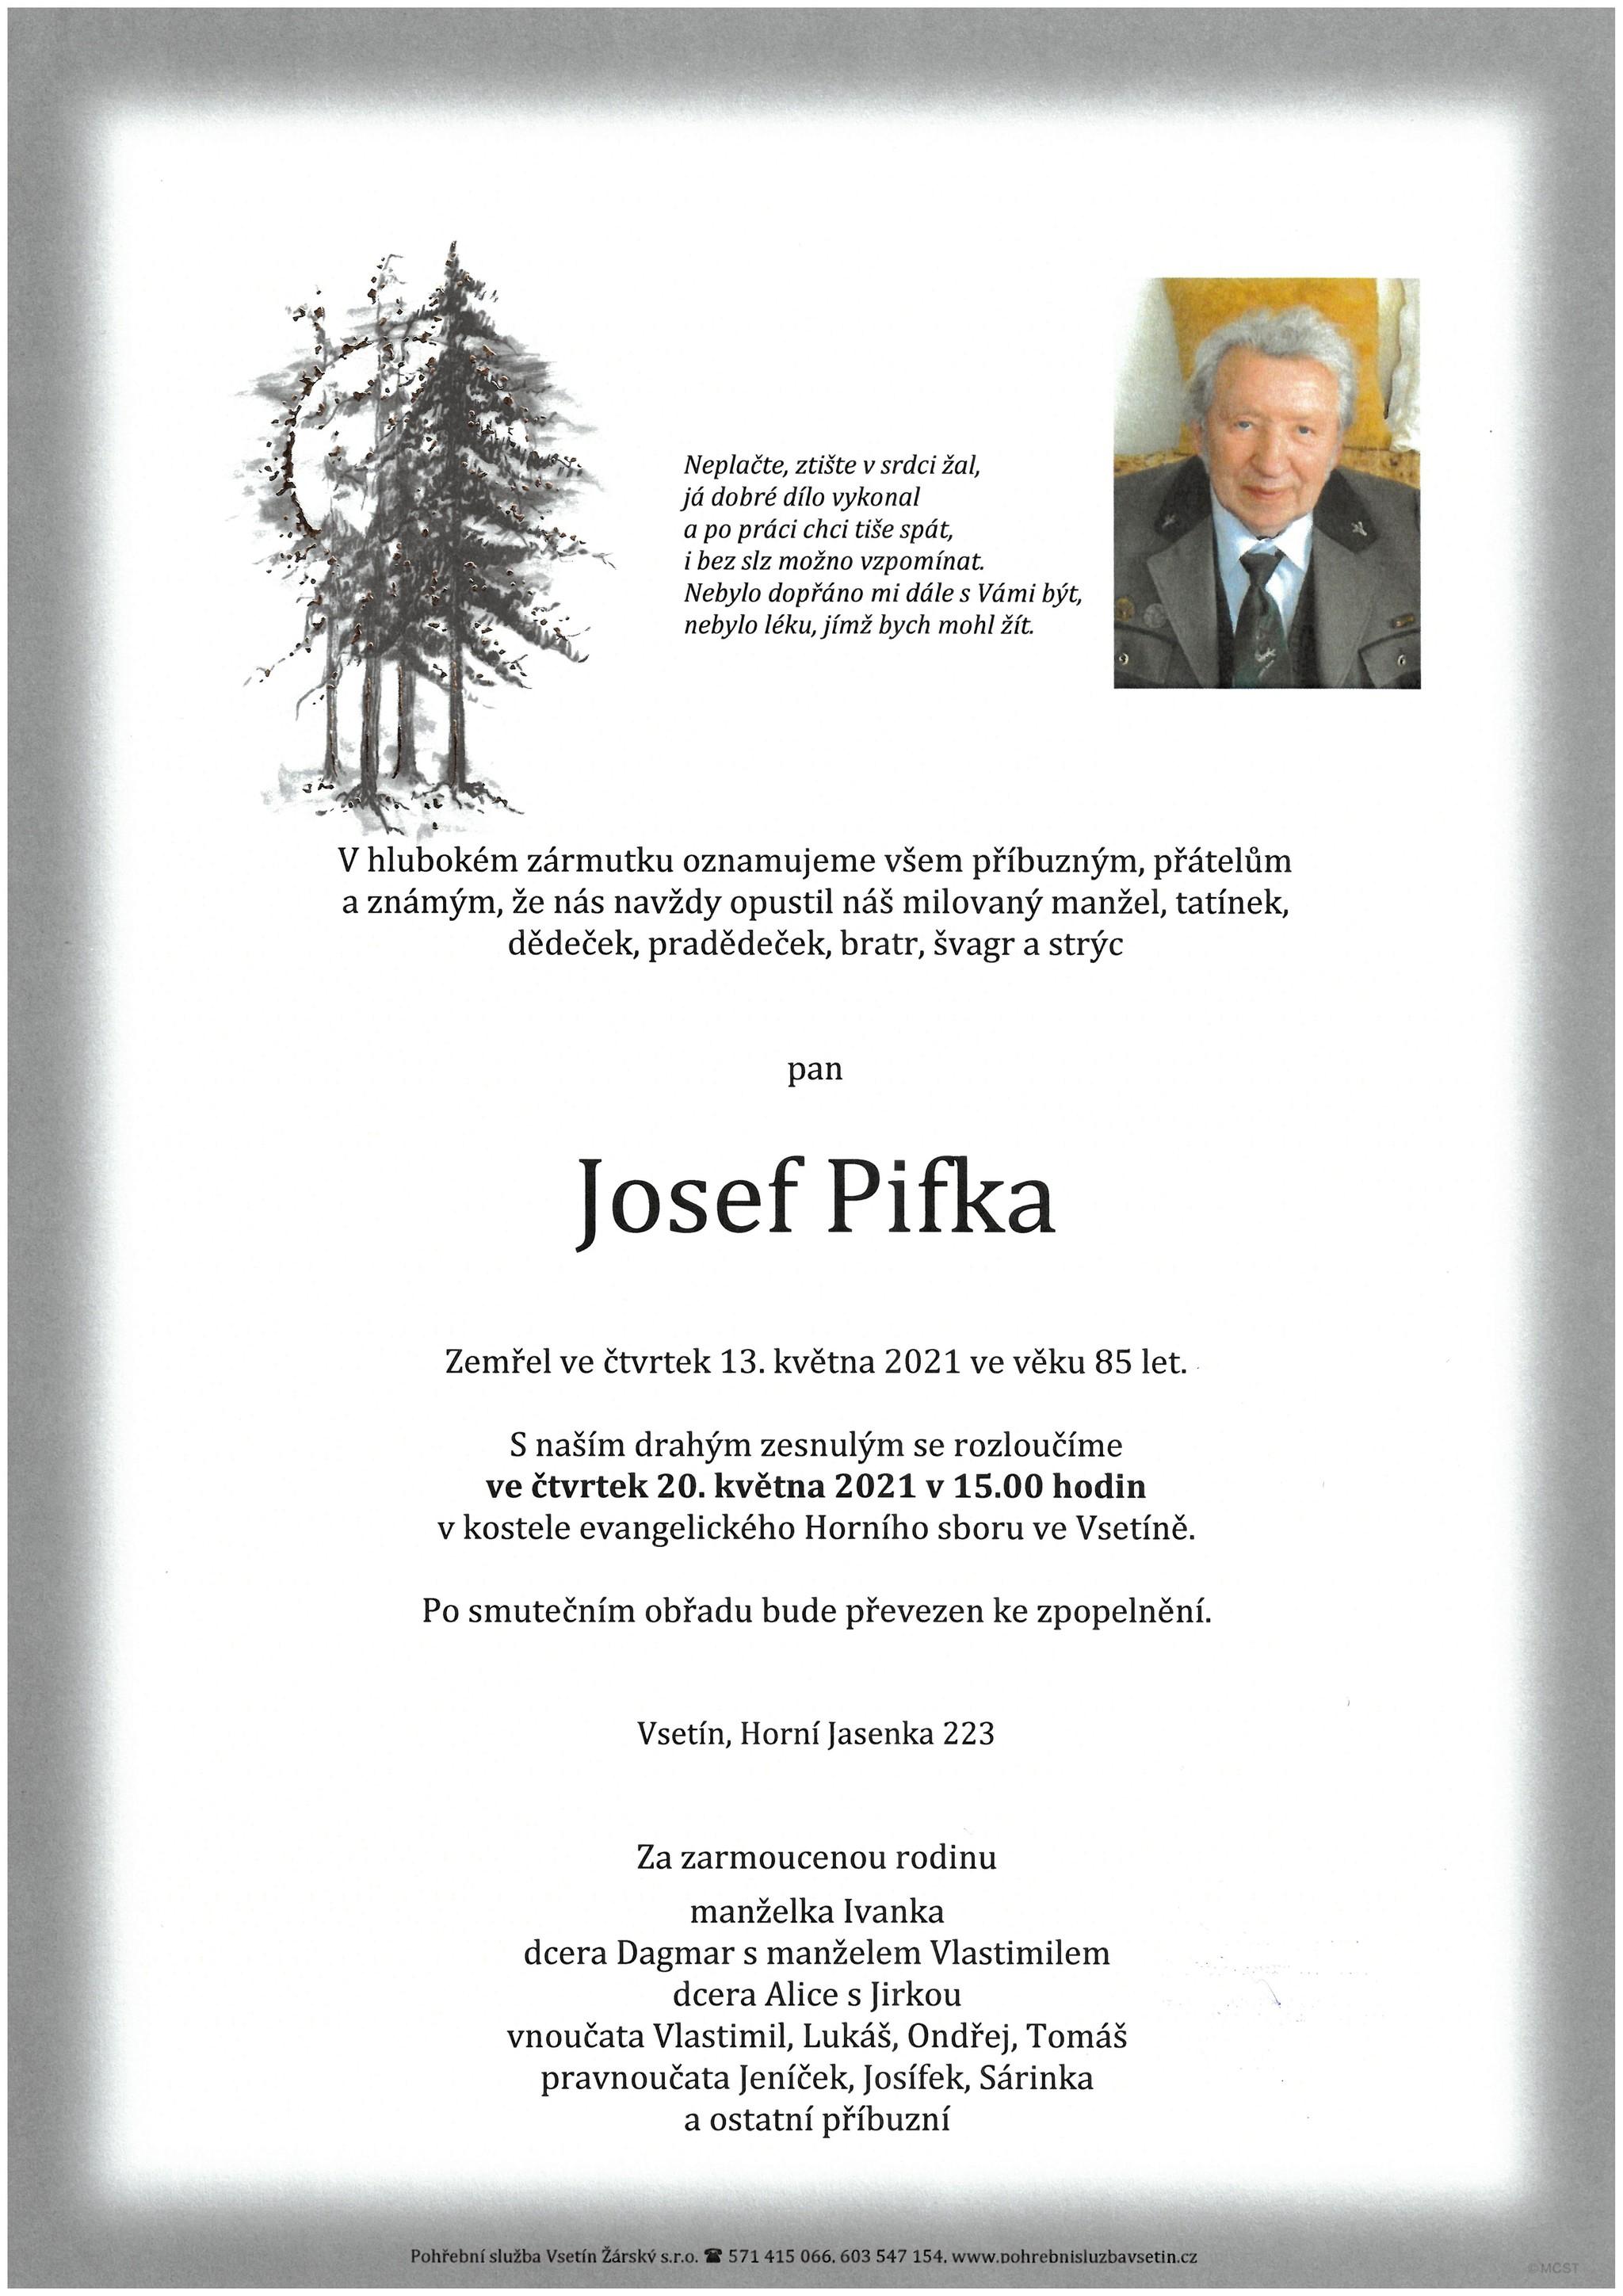 Josef Pifka